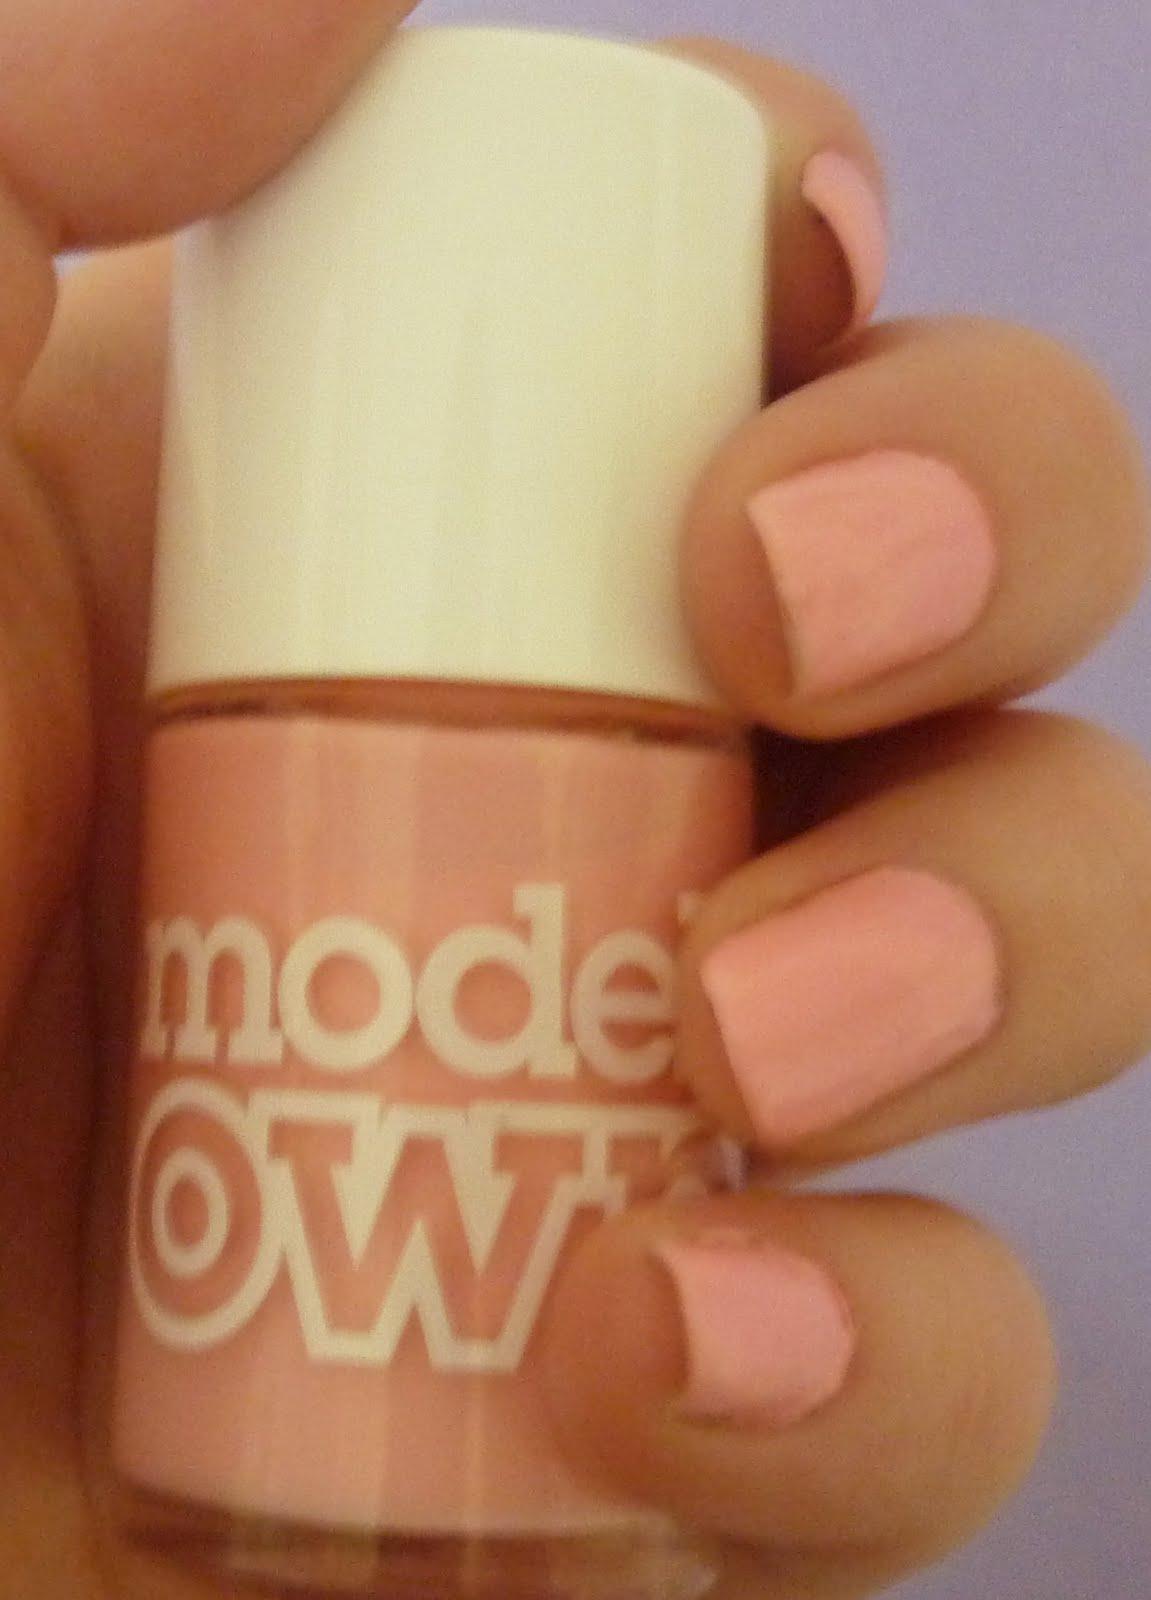 NOTD – Models Own 'Pastel Pink'